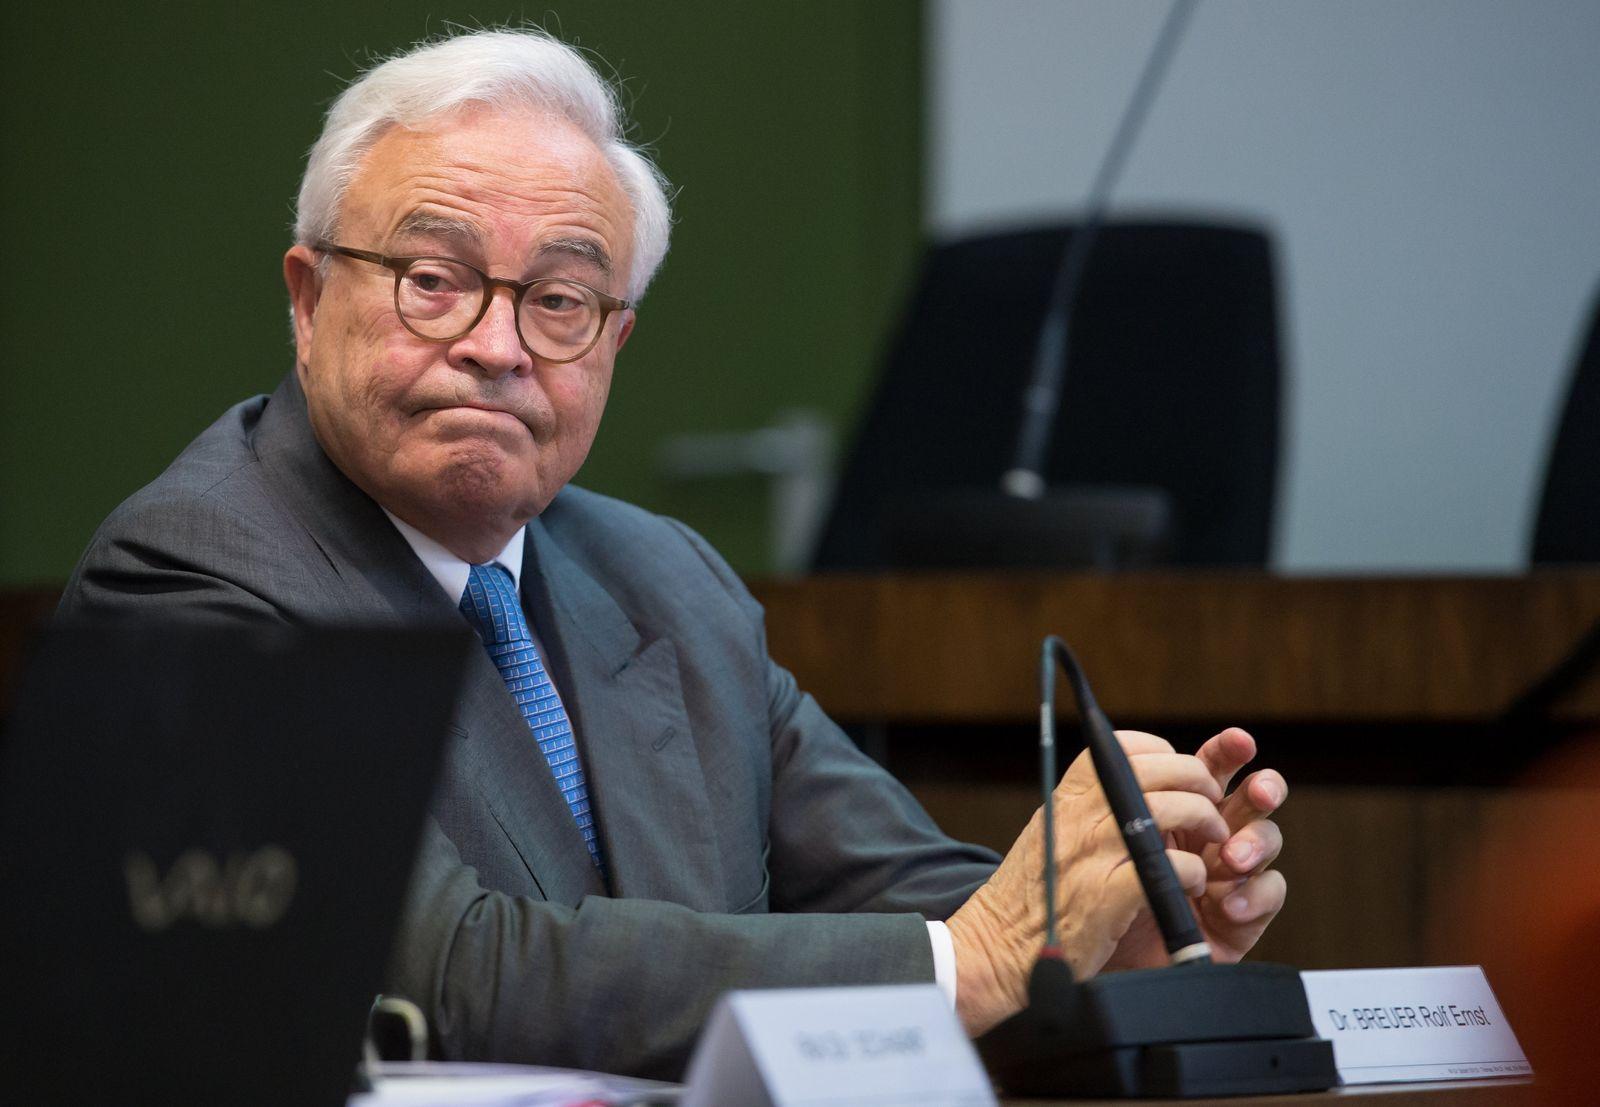 Prozess gegen Deutsche-Bank-Manager - Fortsetzung